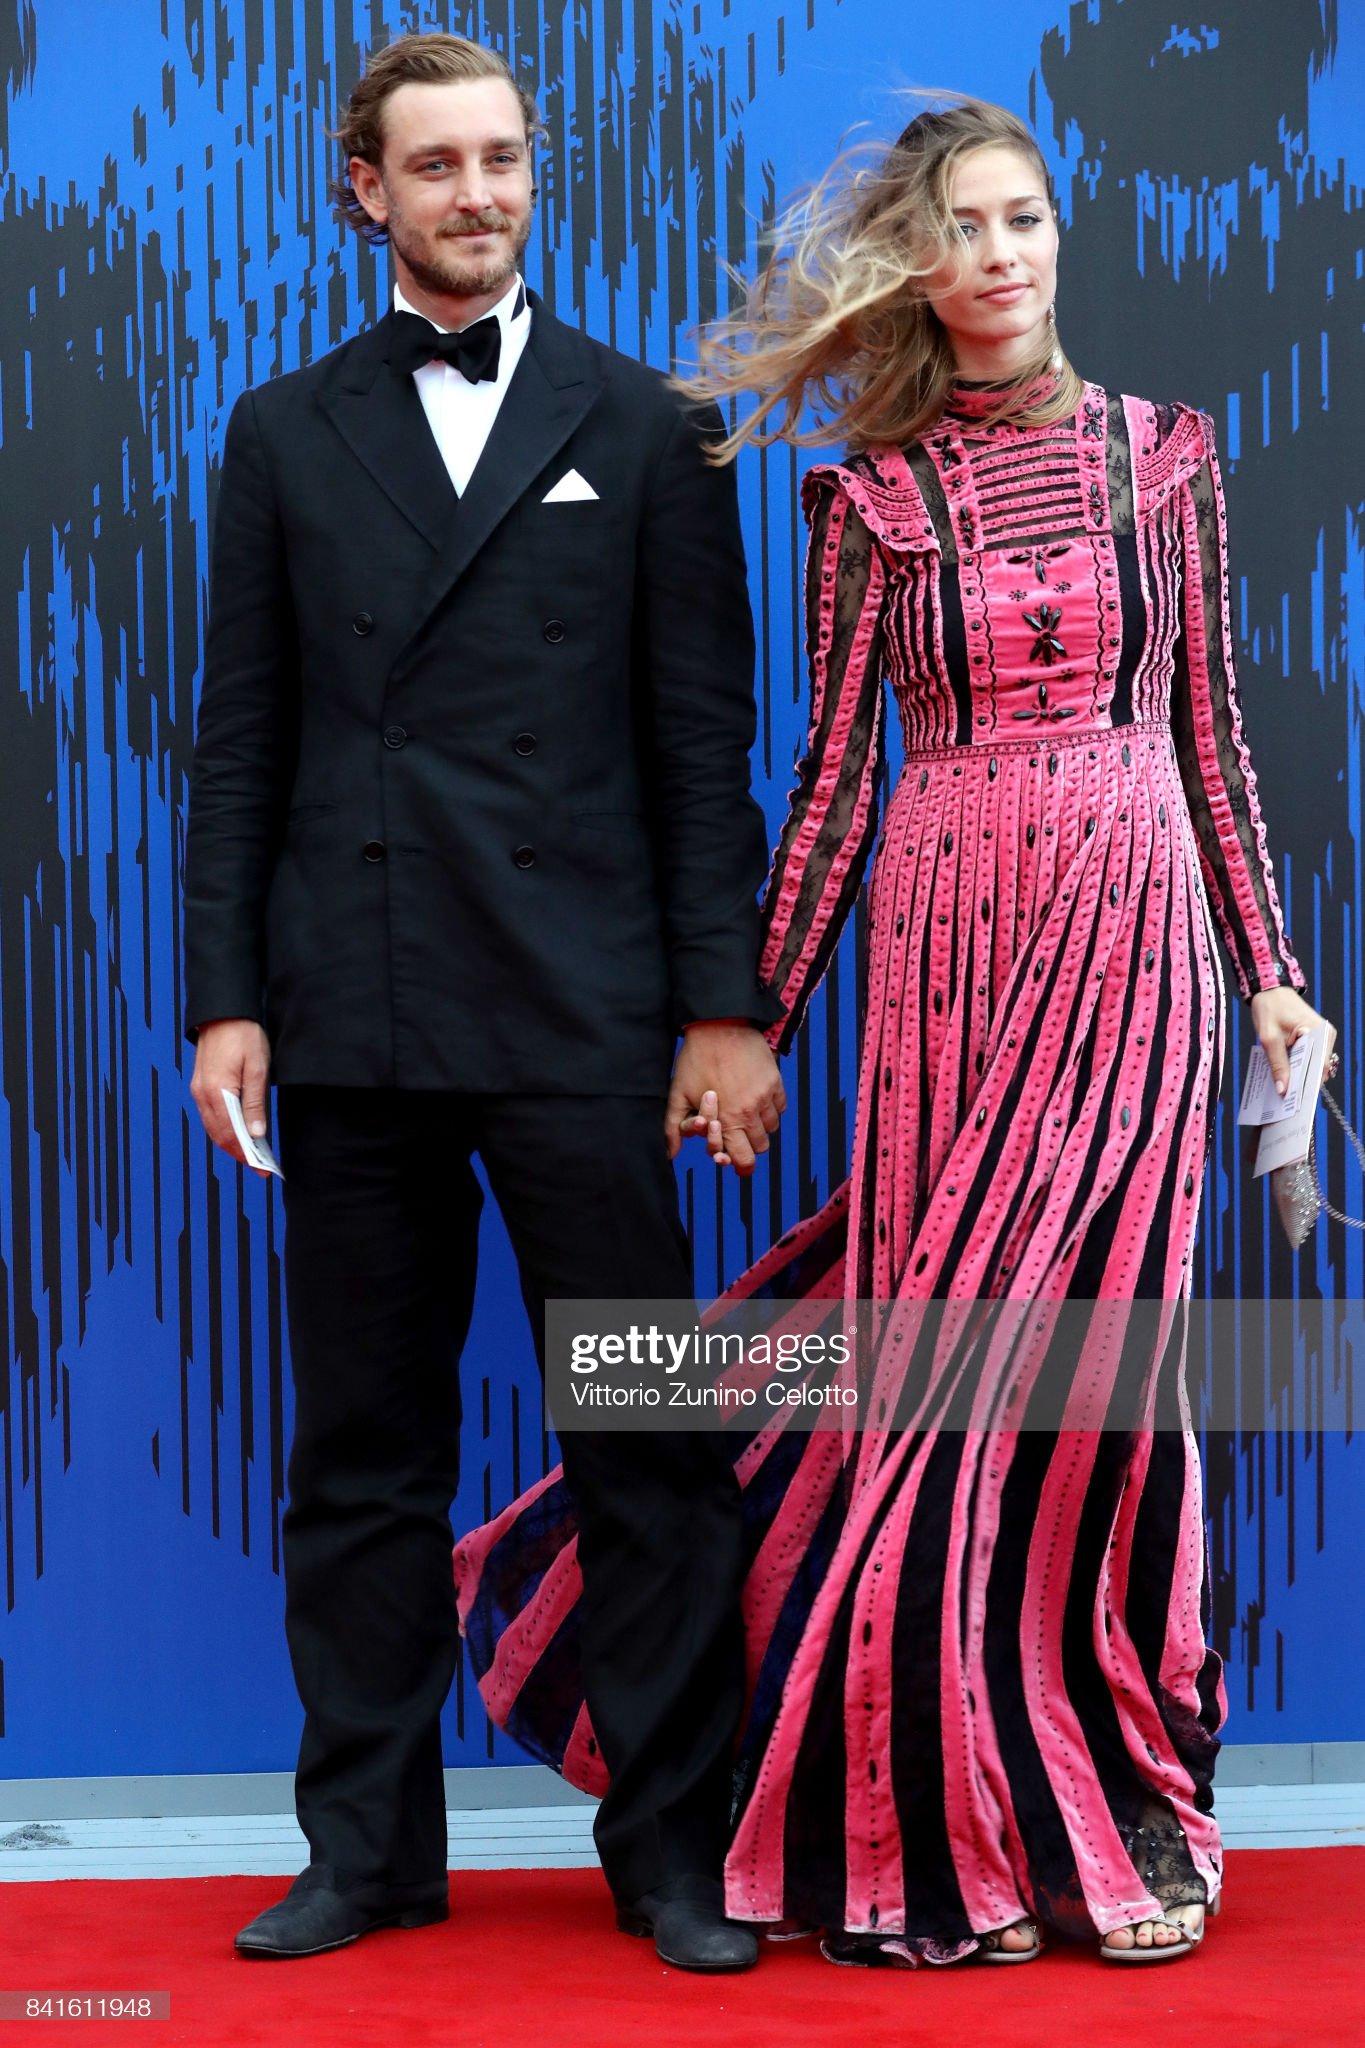 The Franca Sozzani Award - 74th Venice Film Festival : News Photo